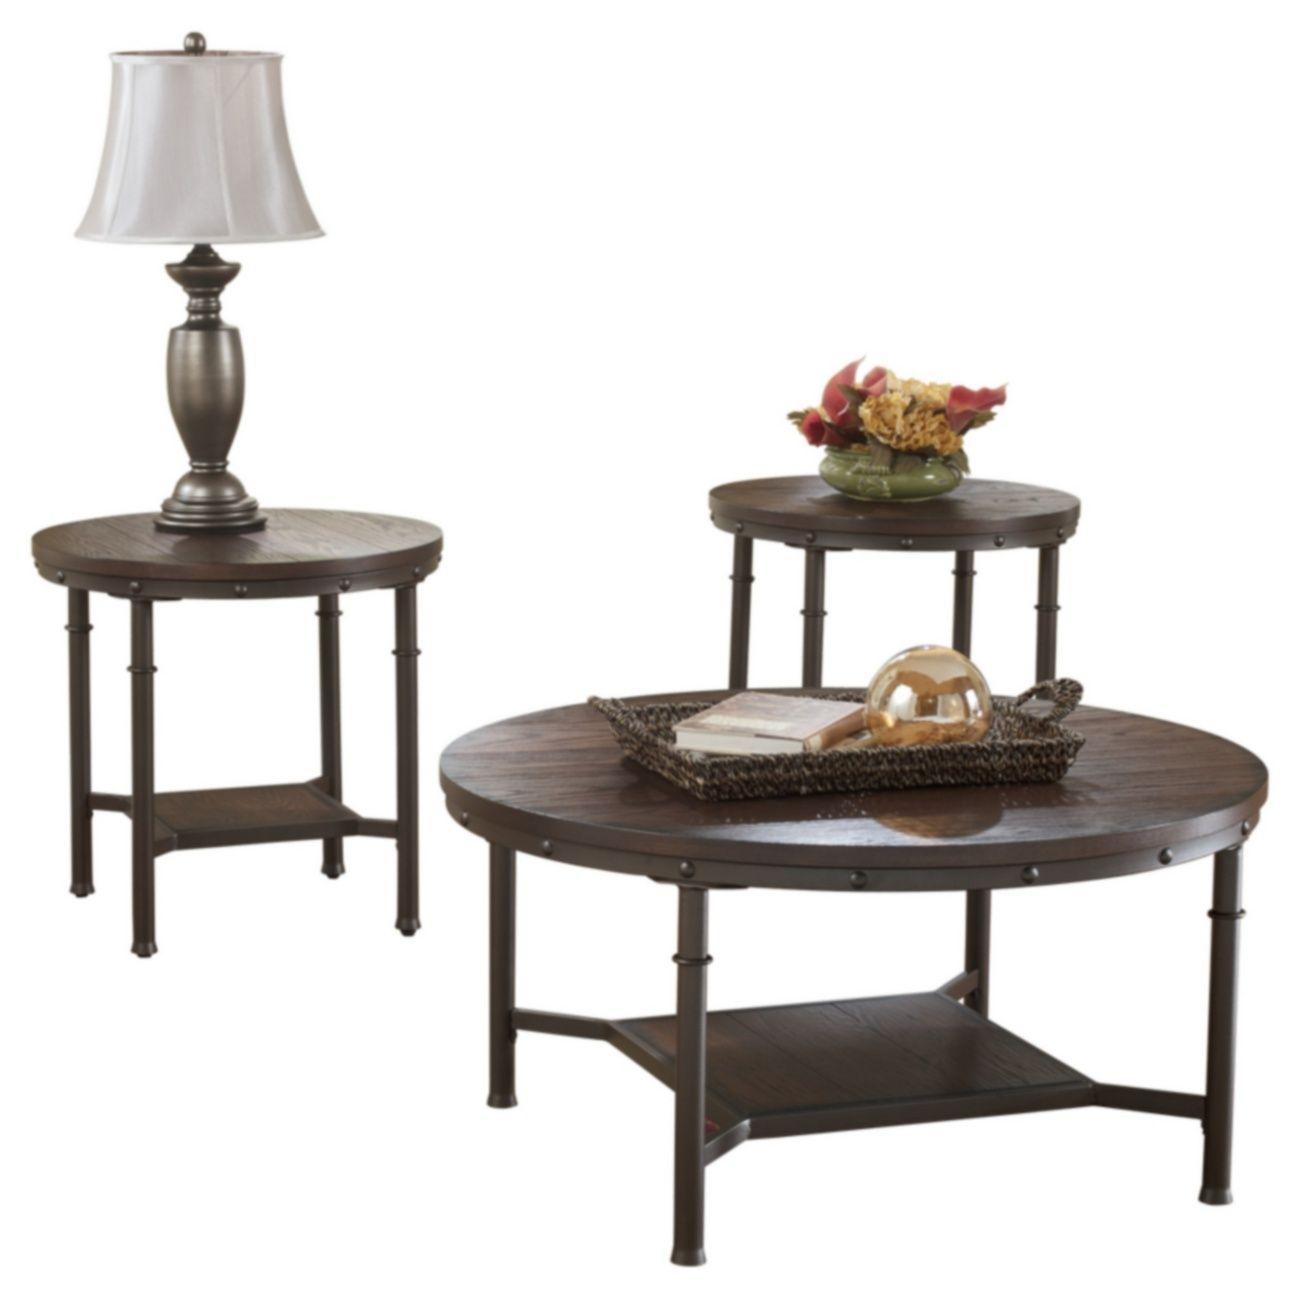 Signature Design Sandling Occasionnel 3 Pces Set De Table Meubles Ashley T277 13 Living Room Table Sets Coffee Table Rustic Living Room Furniture [ 1299 x 1300 Pixel ]